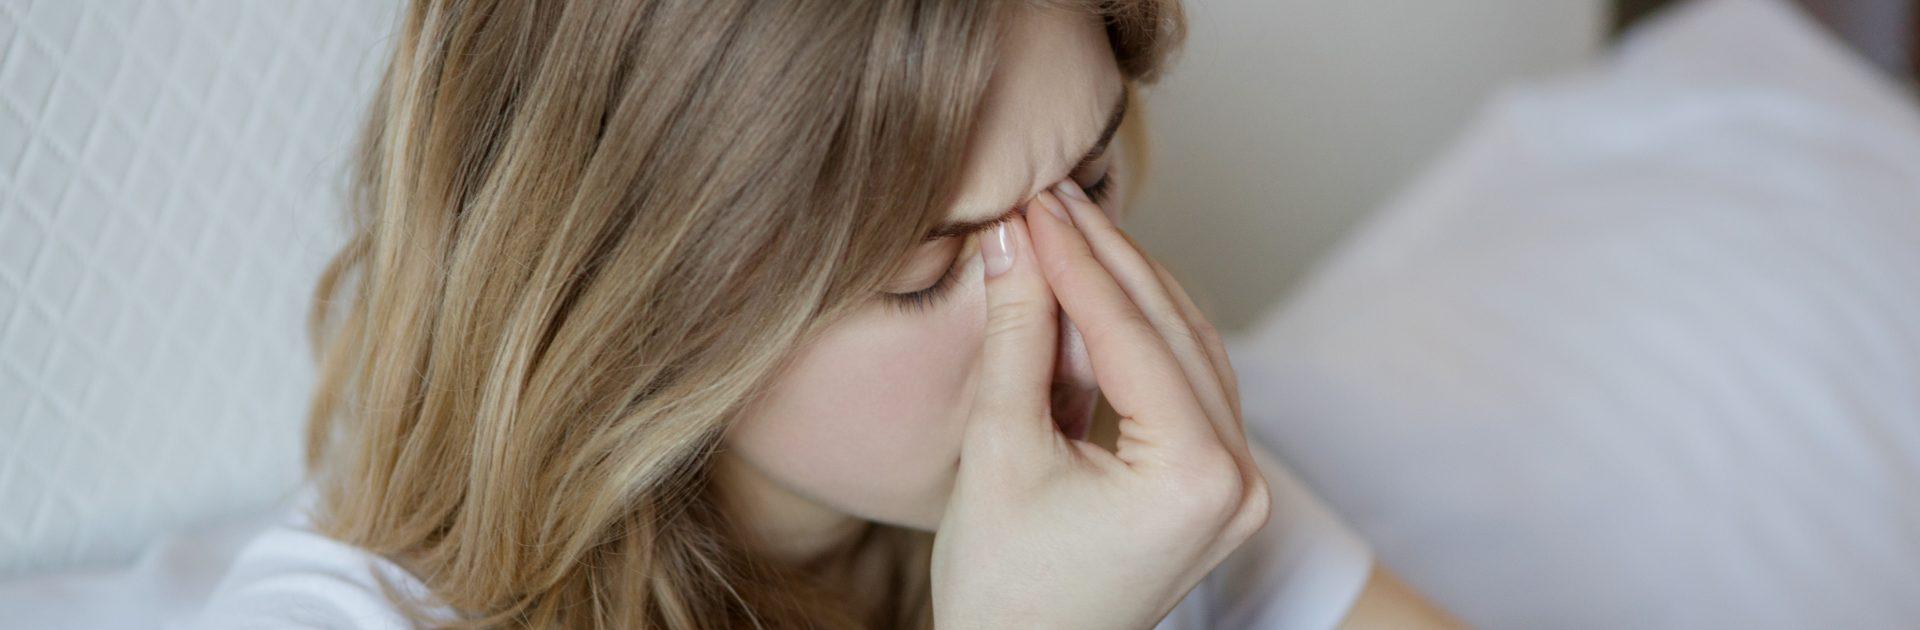 Frau mit Kieferhöhlenentzündung fasst sich an den schmerzenden Nasenbereich.